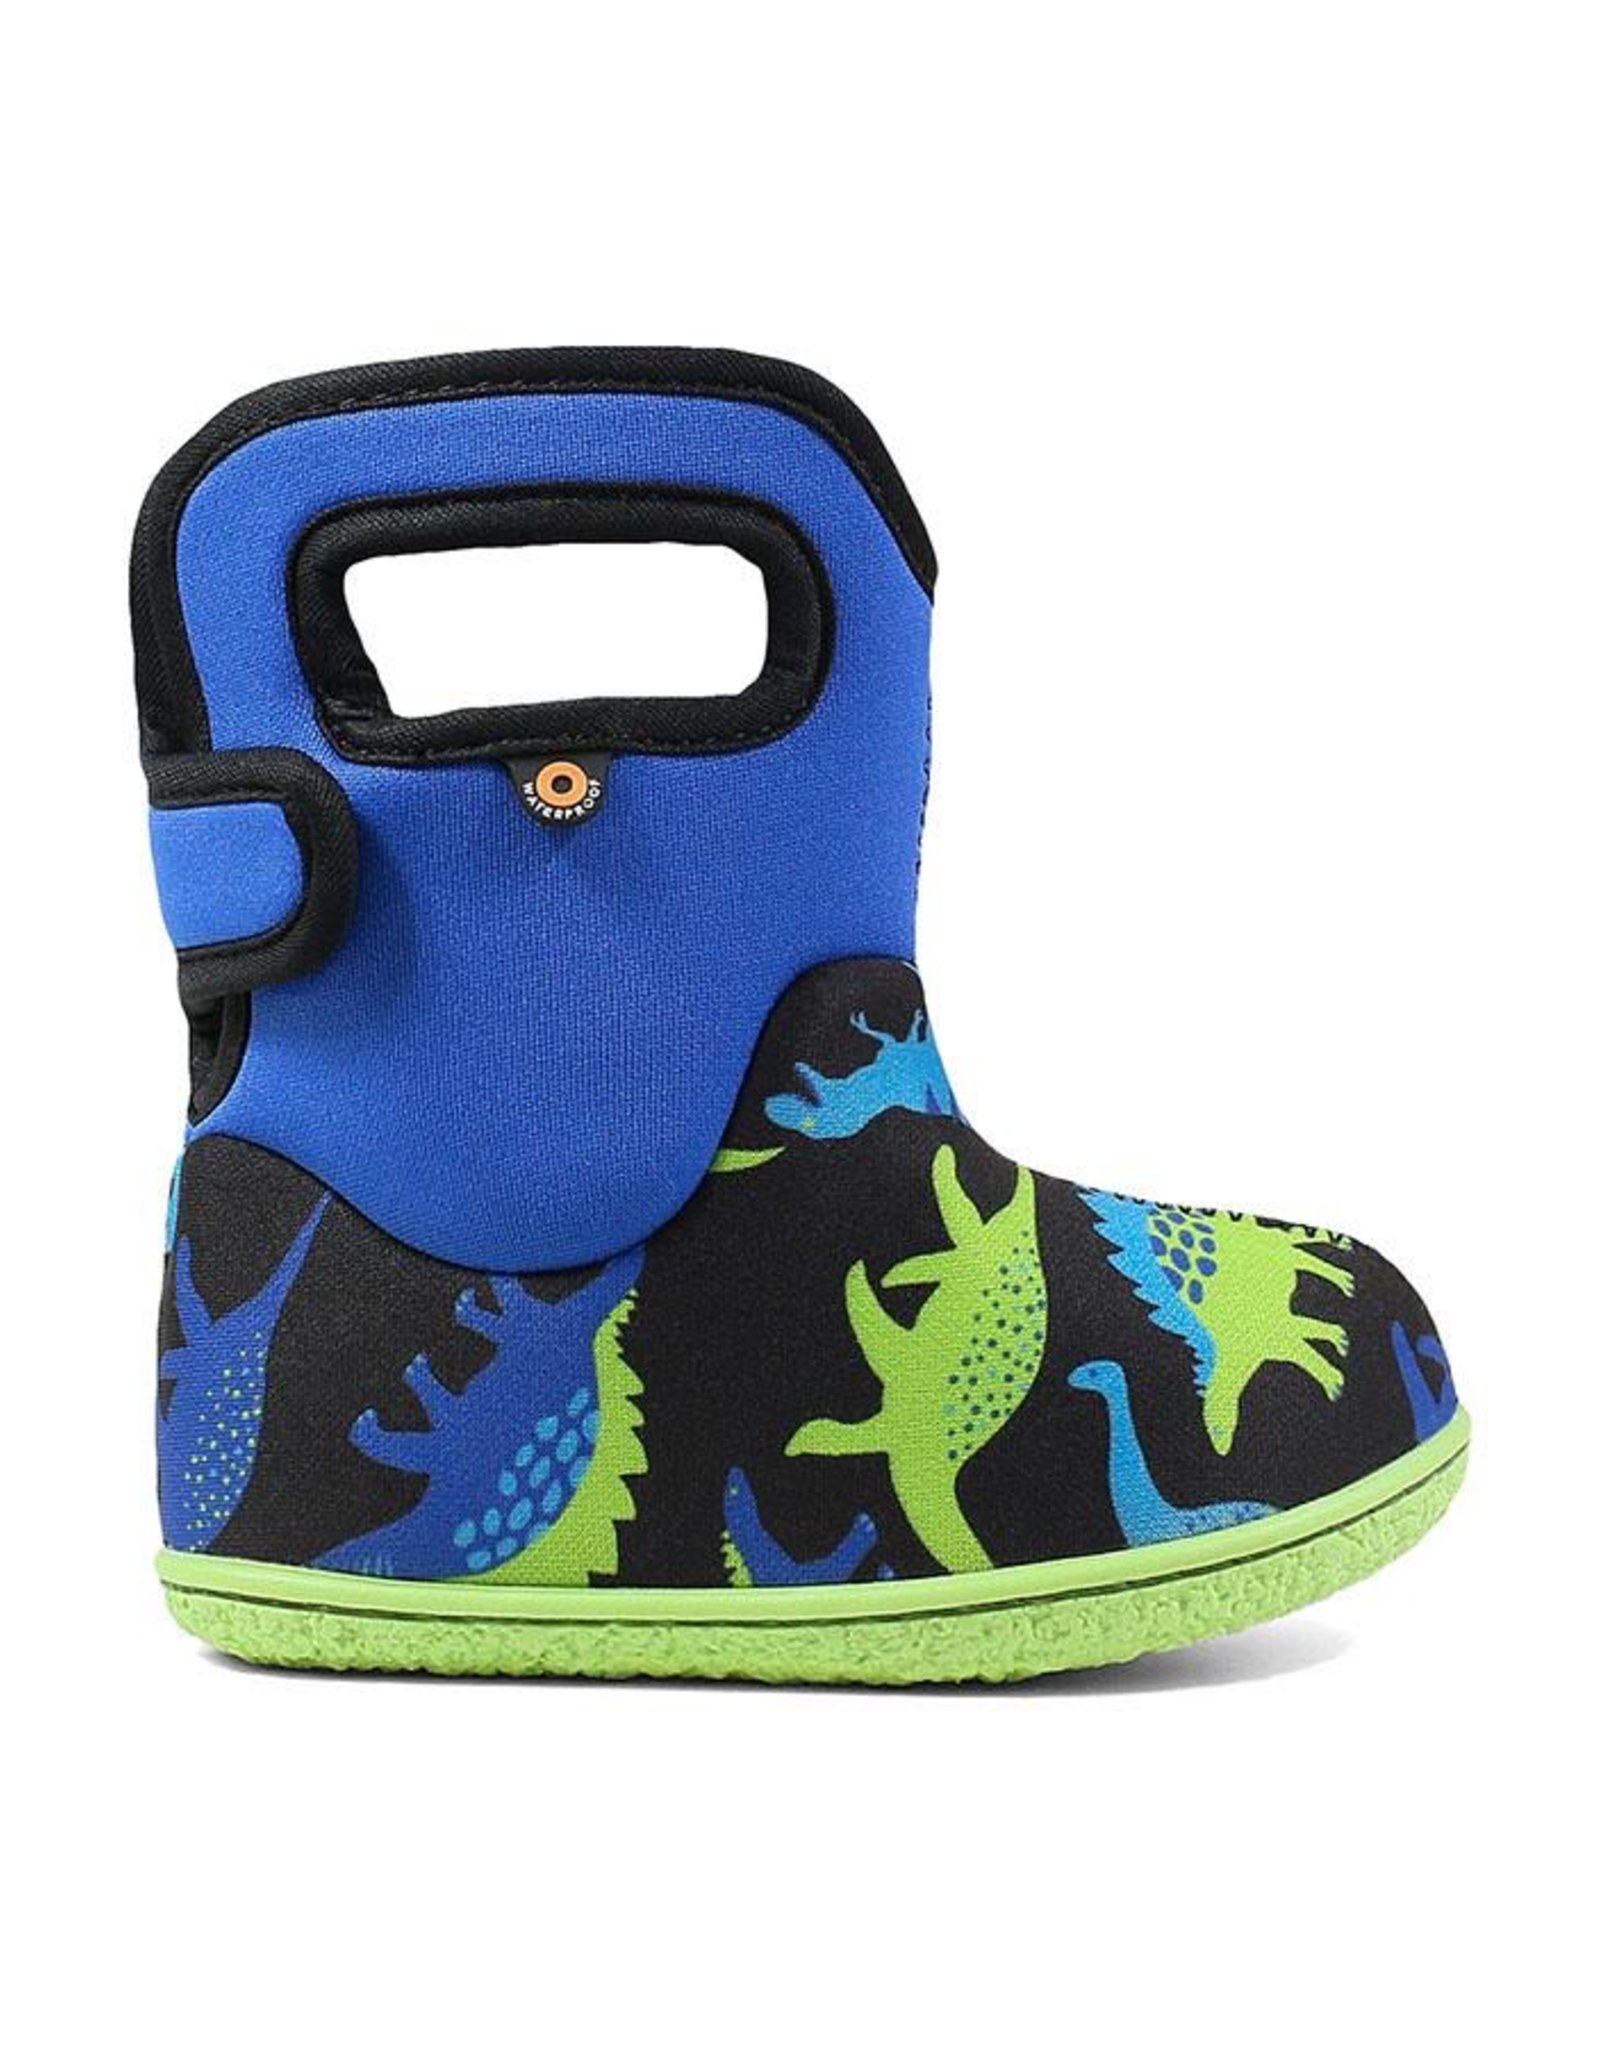 Bogs Baby Bogs Dino Waterproof Boots